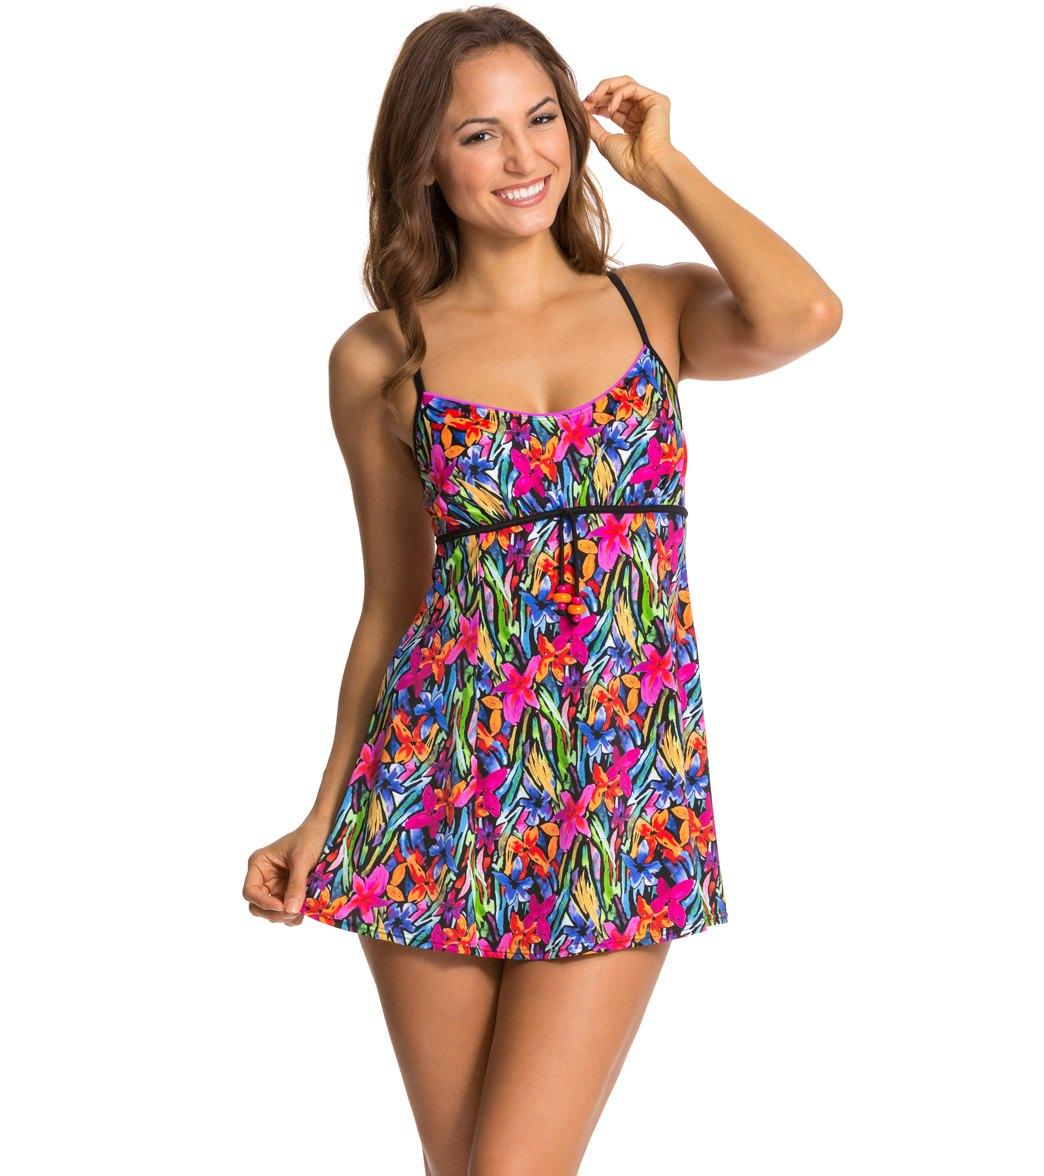 aa5088e9e3a9f Fit4U Brush Stroke Drawstring Swim Dress at SwimOutlet.com - Free ...